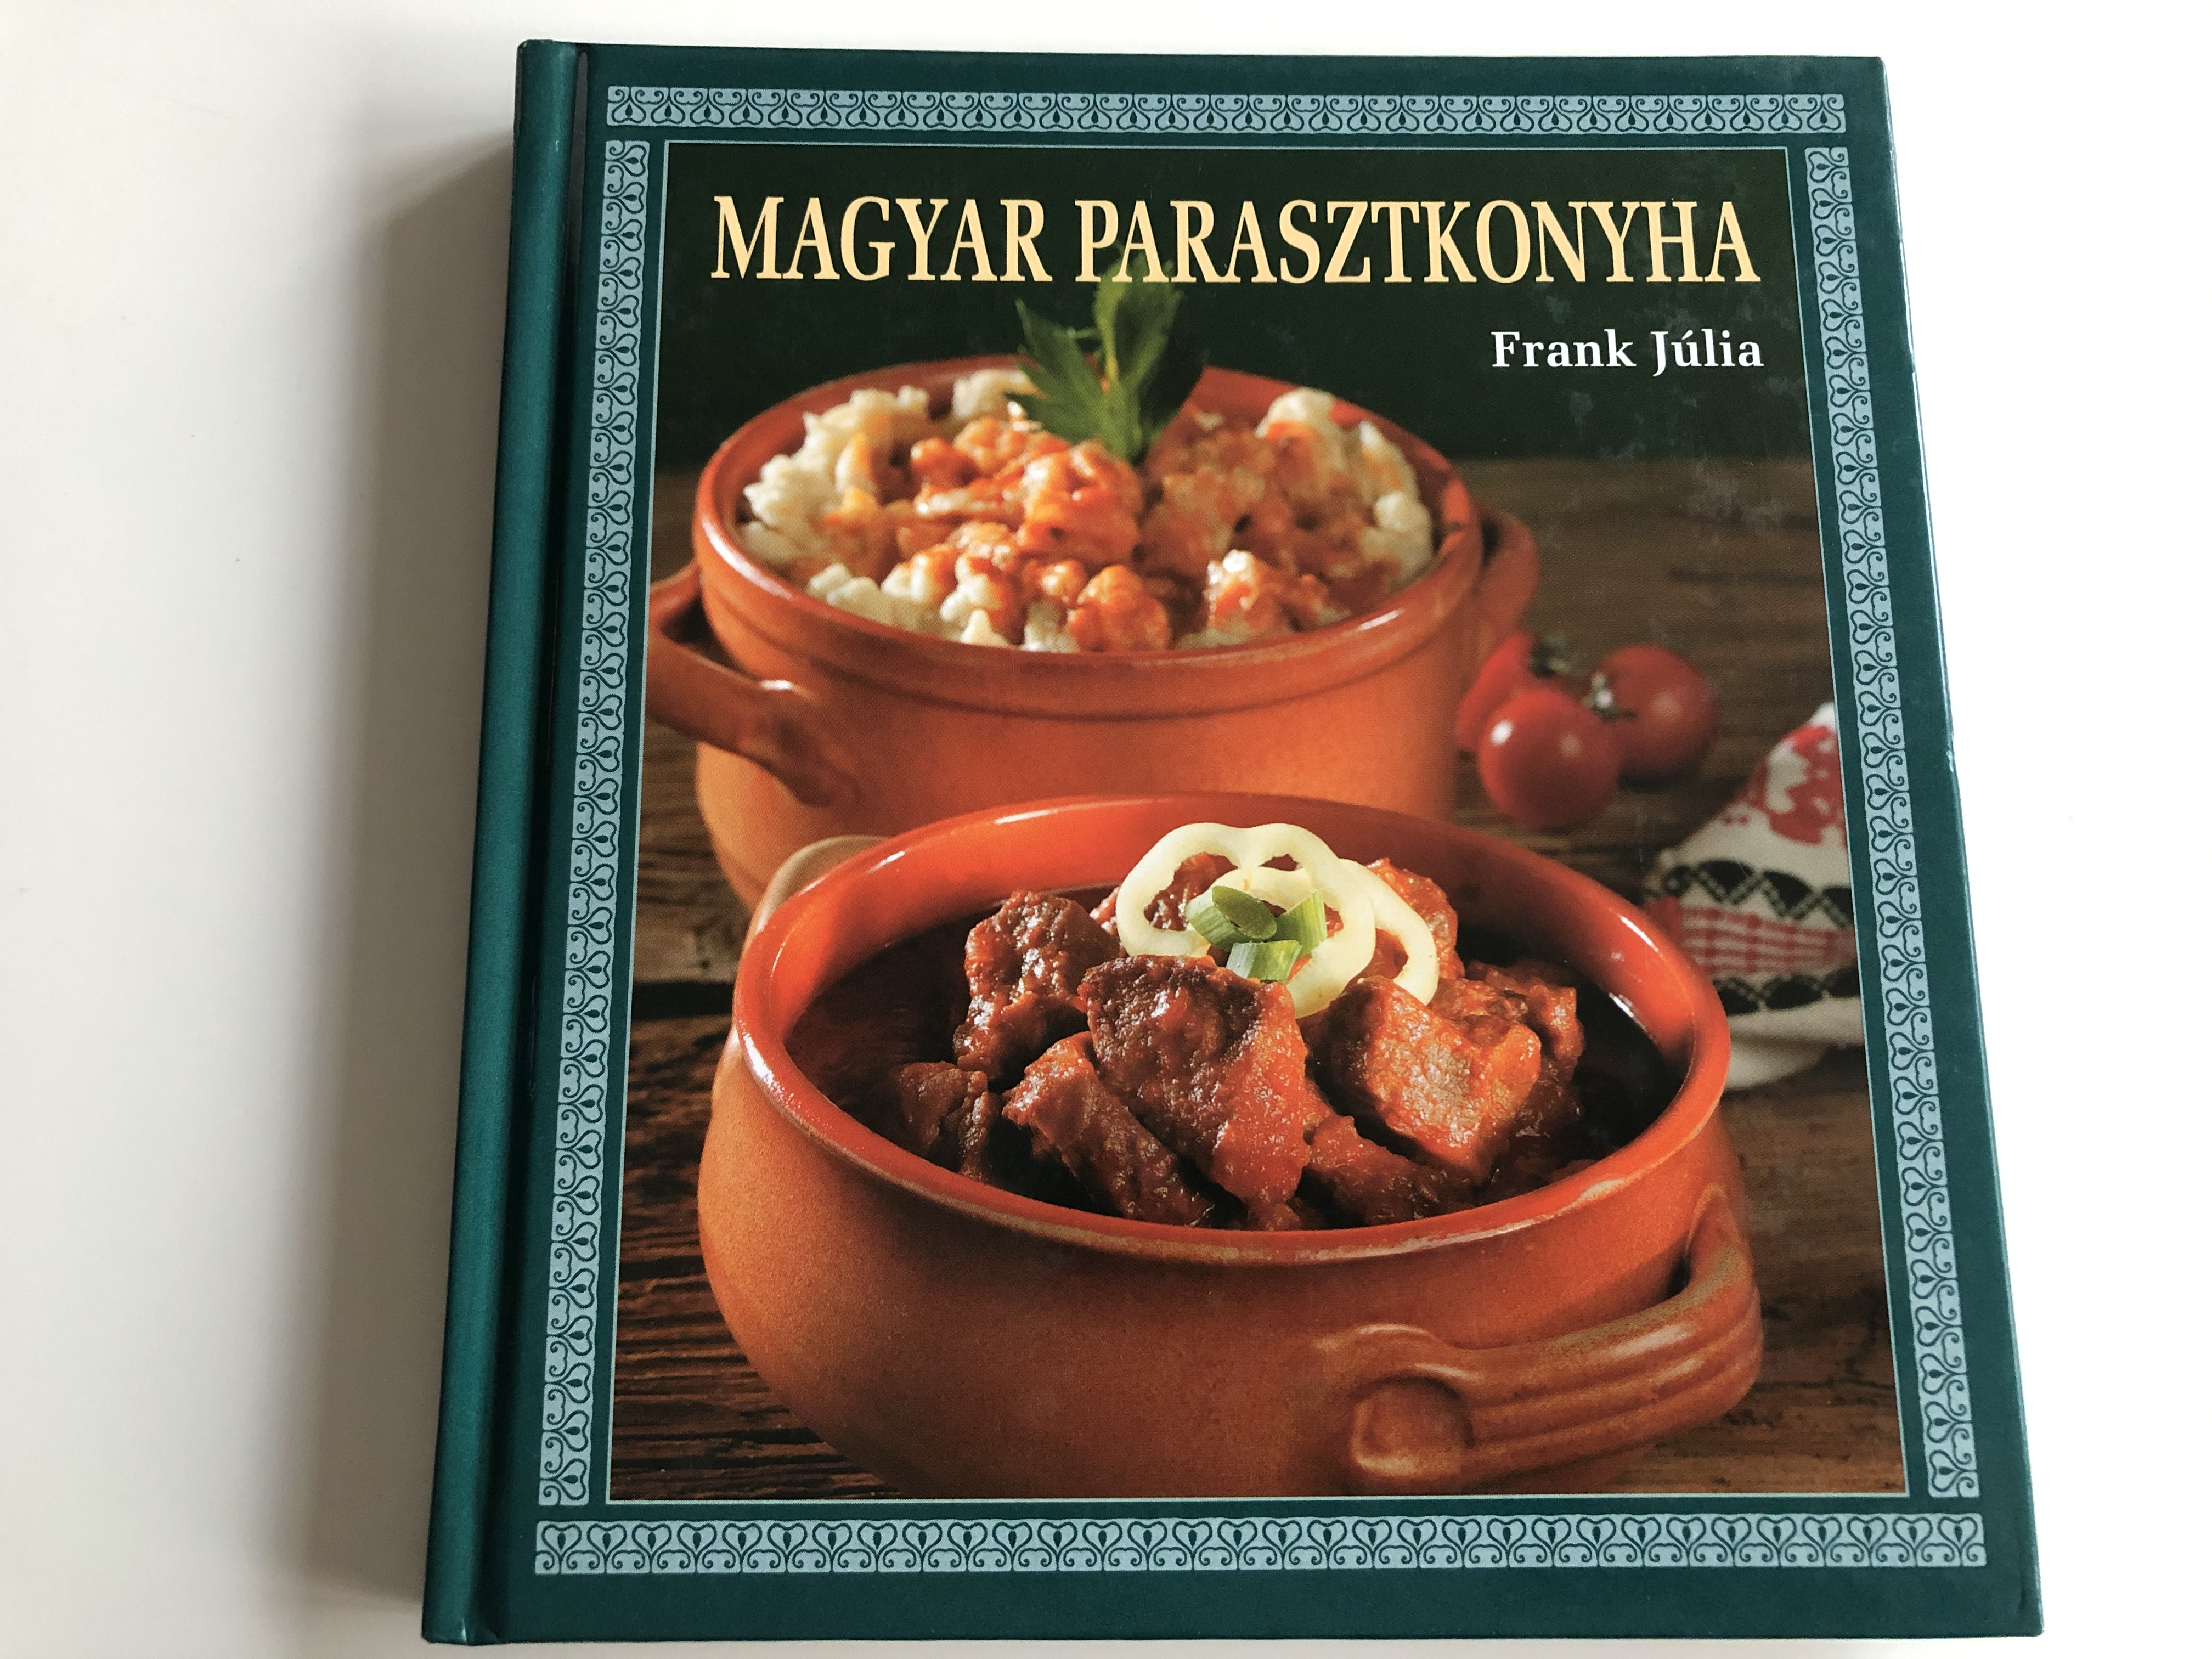 magyar-parasztkonyha-by-frank-j-lia-corvina-kiad-2005-1.jpg